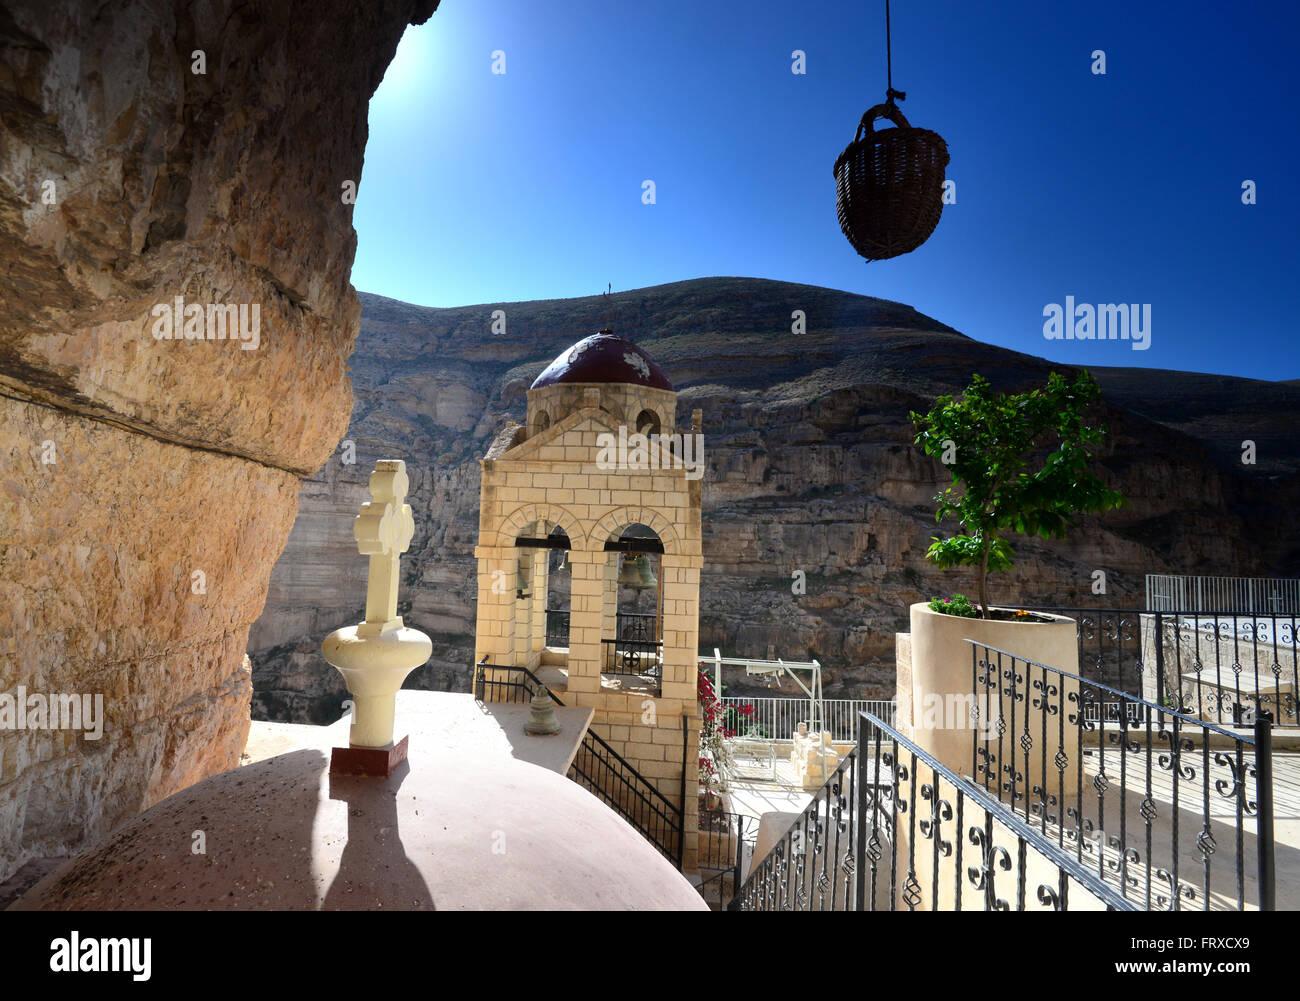 St George's monastary near Jericho, Palestine near Israel - Stock Image